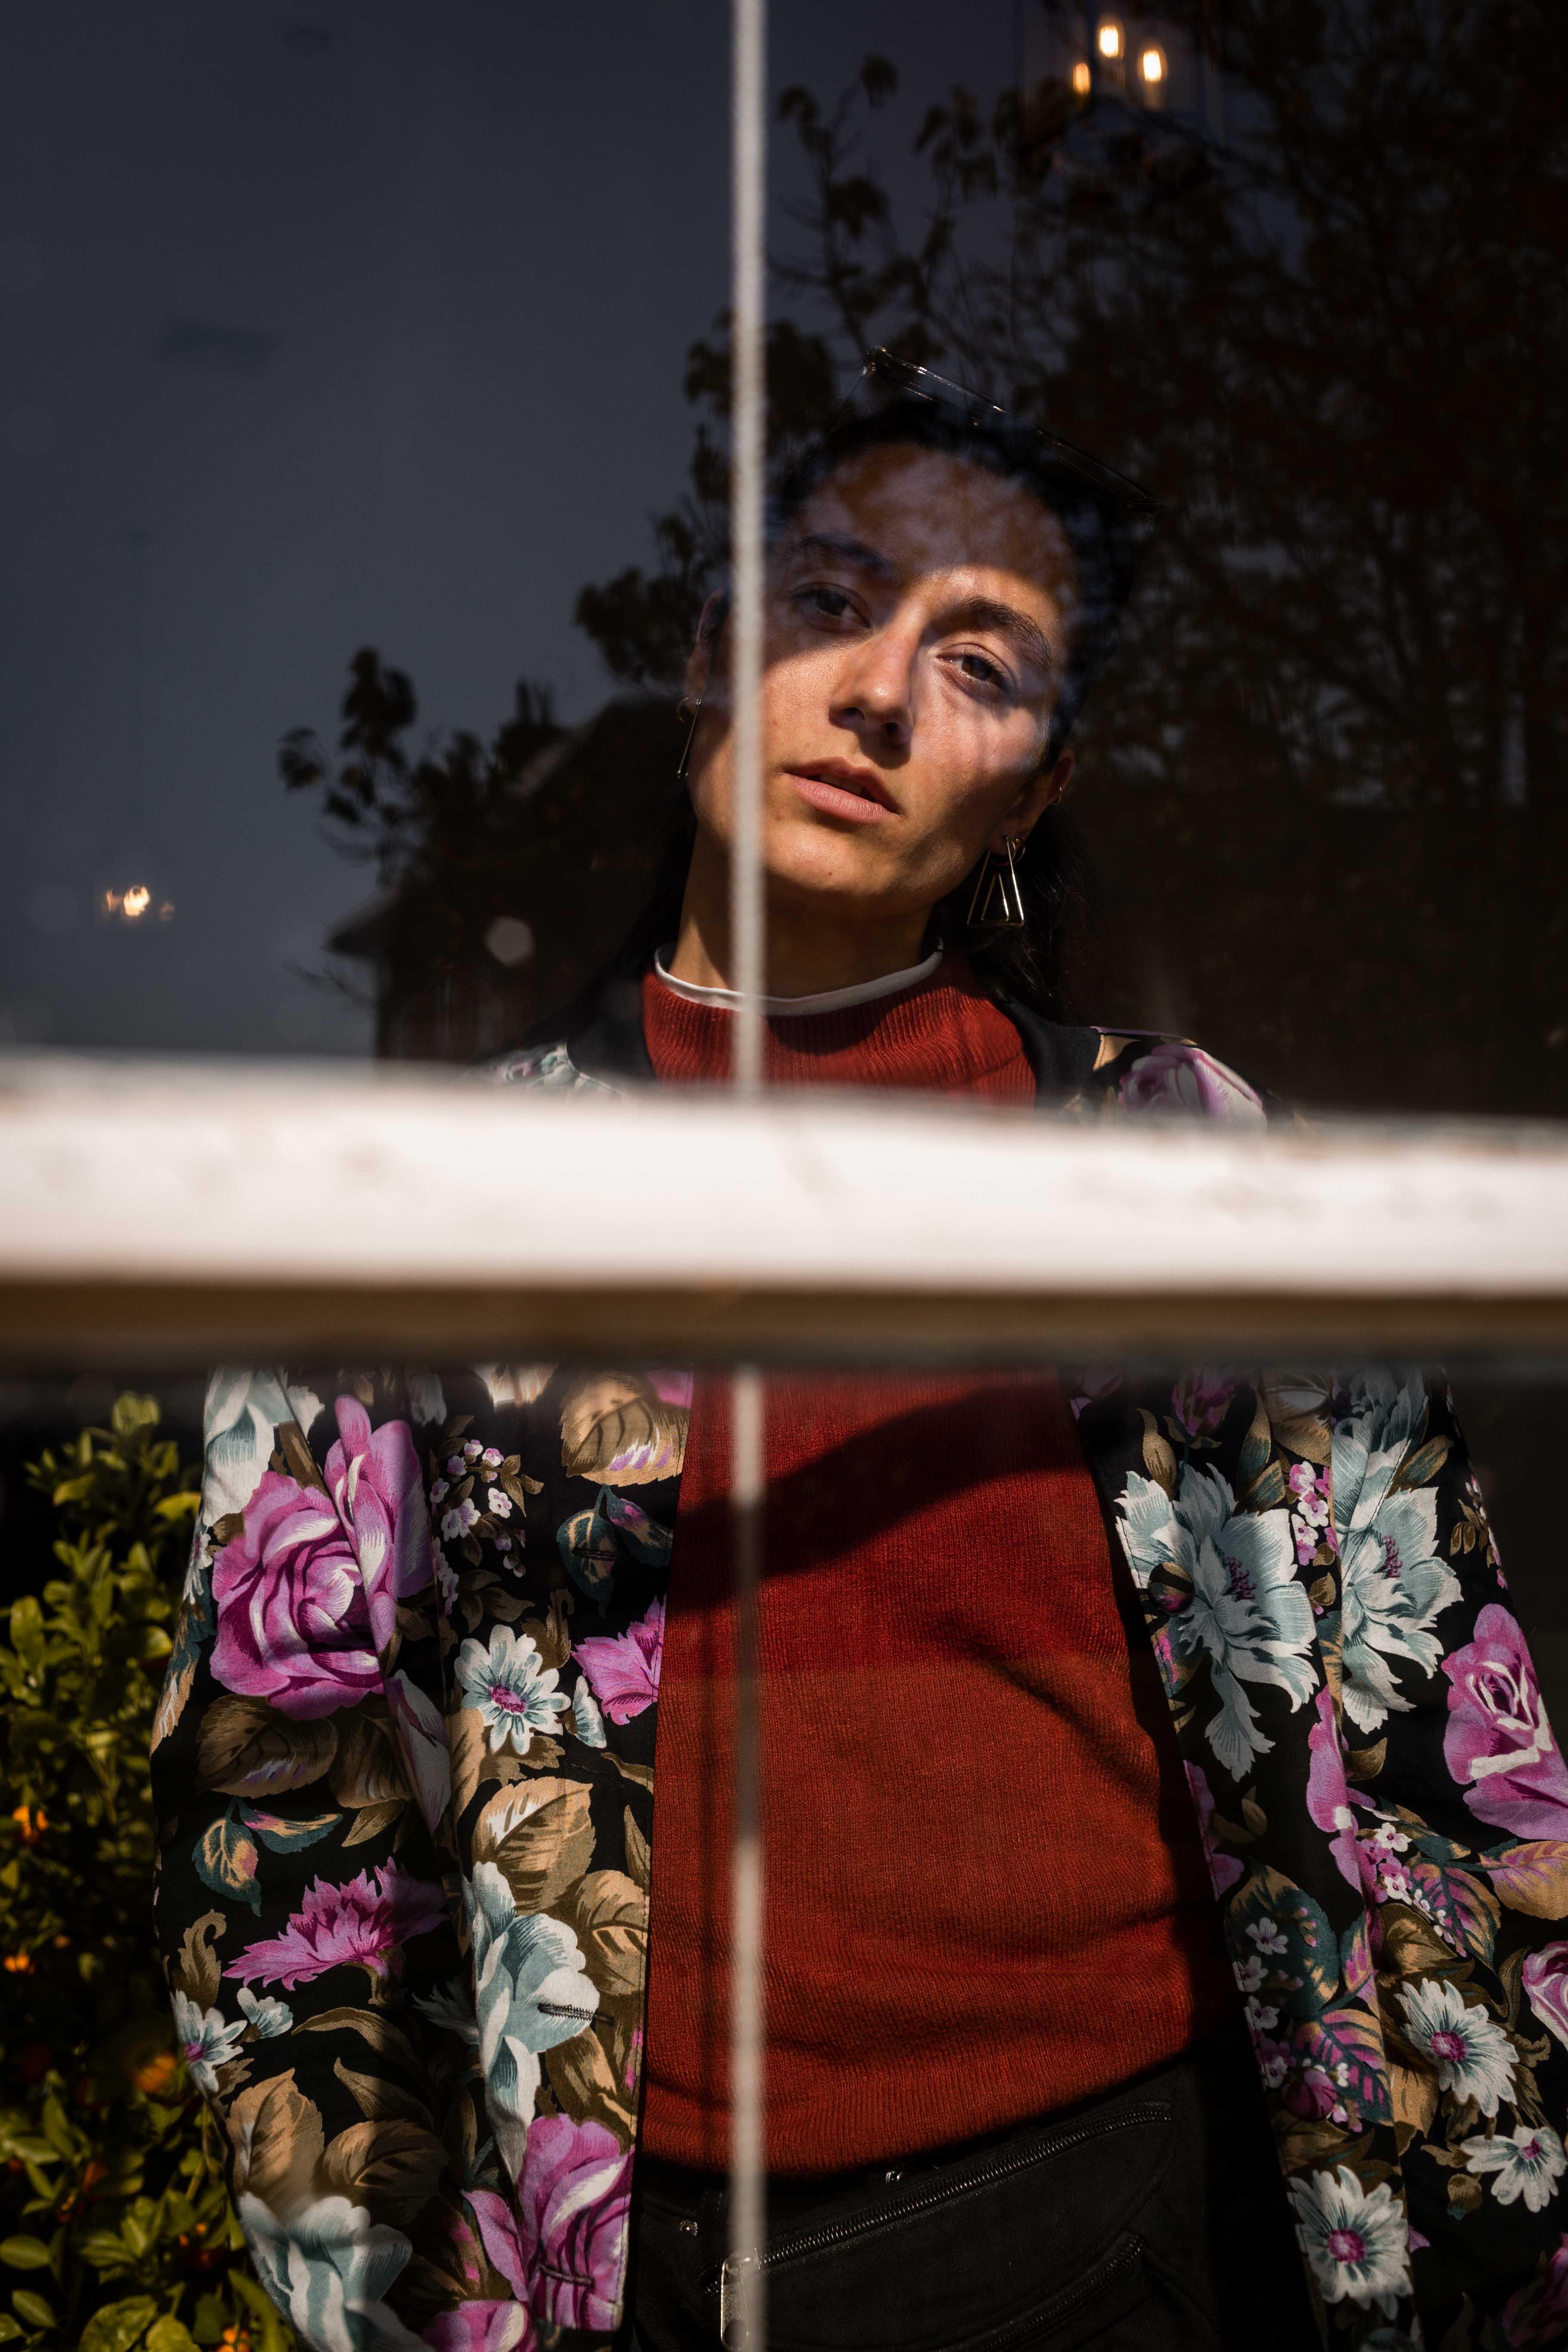 Milan Nechvatal portrait photography